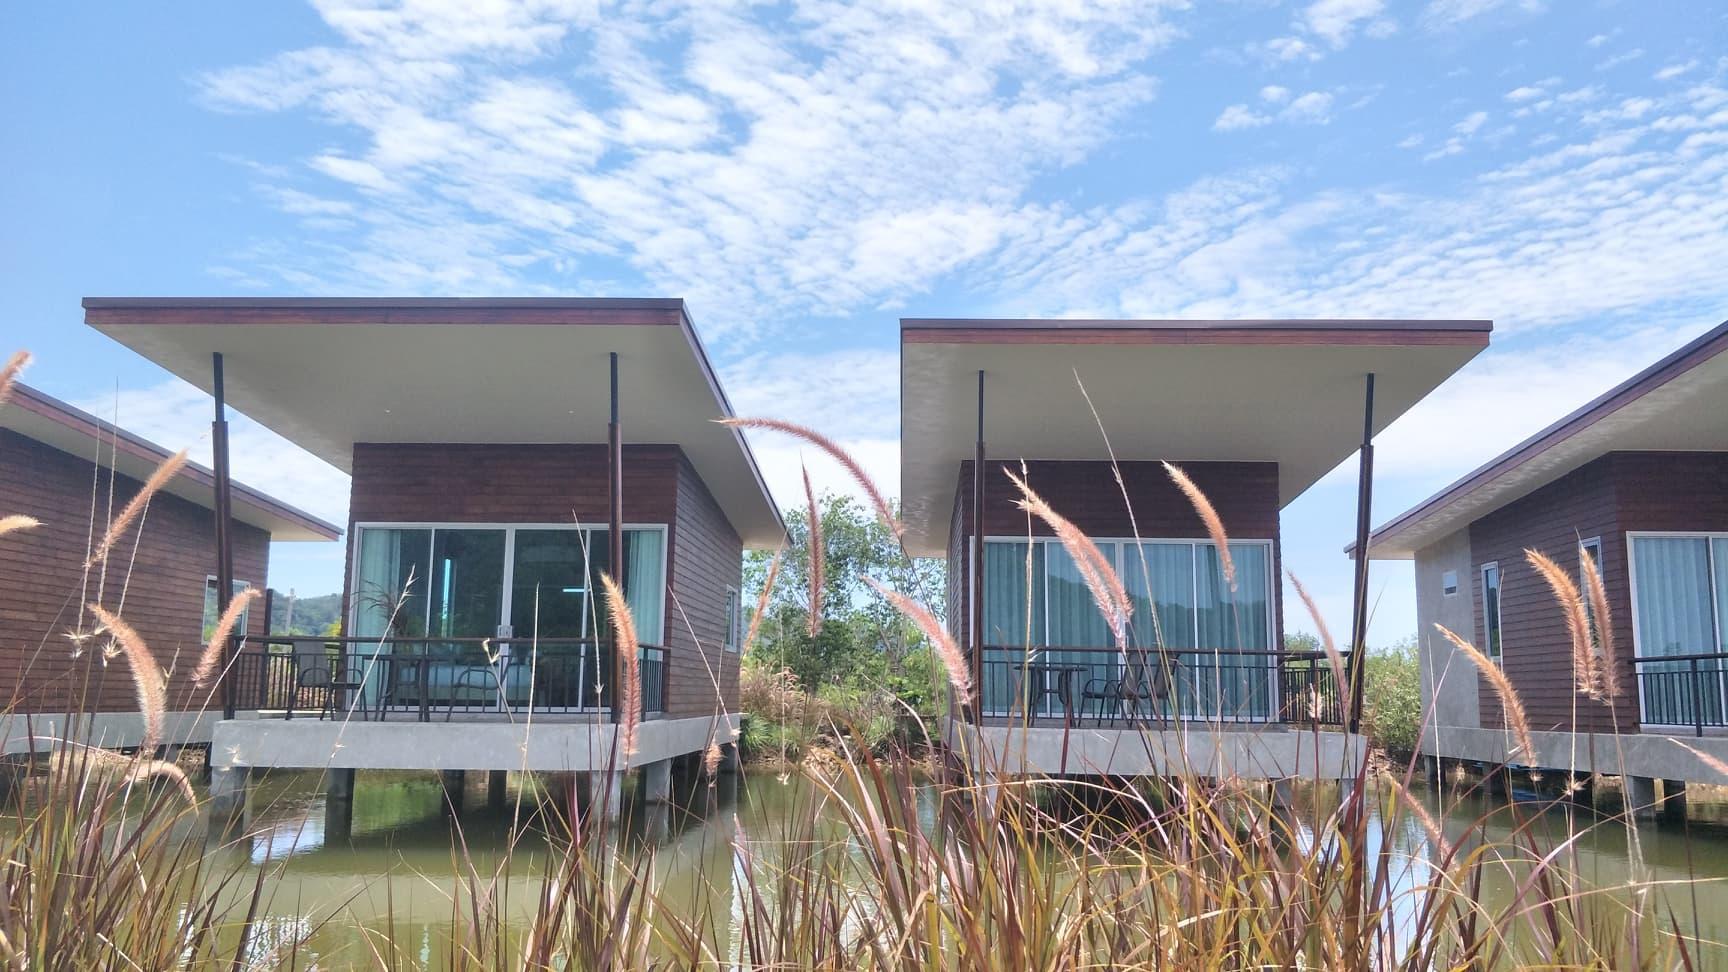 Amantra Lake View วิลลา 1 ห้องนอน 1 ห้องน้ำส่วนตัว ขนาด 55 ตร.ม. – สังกะอู้